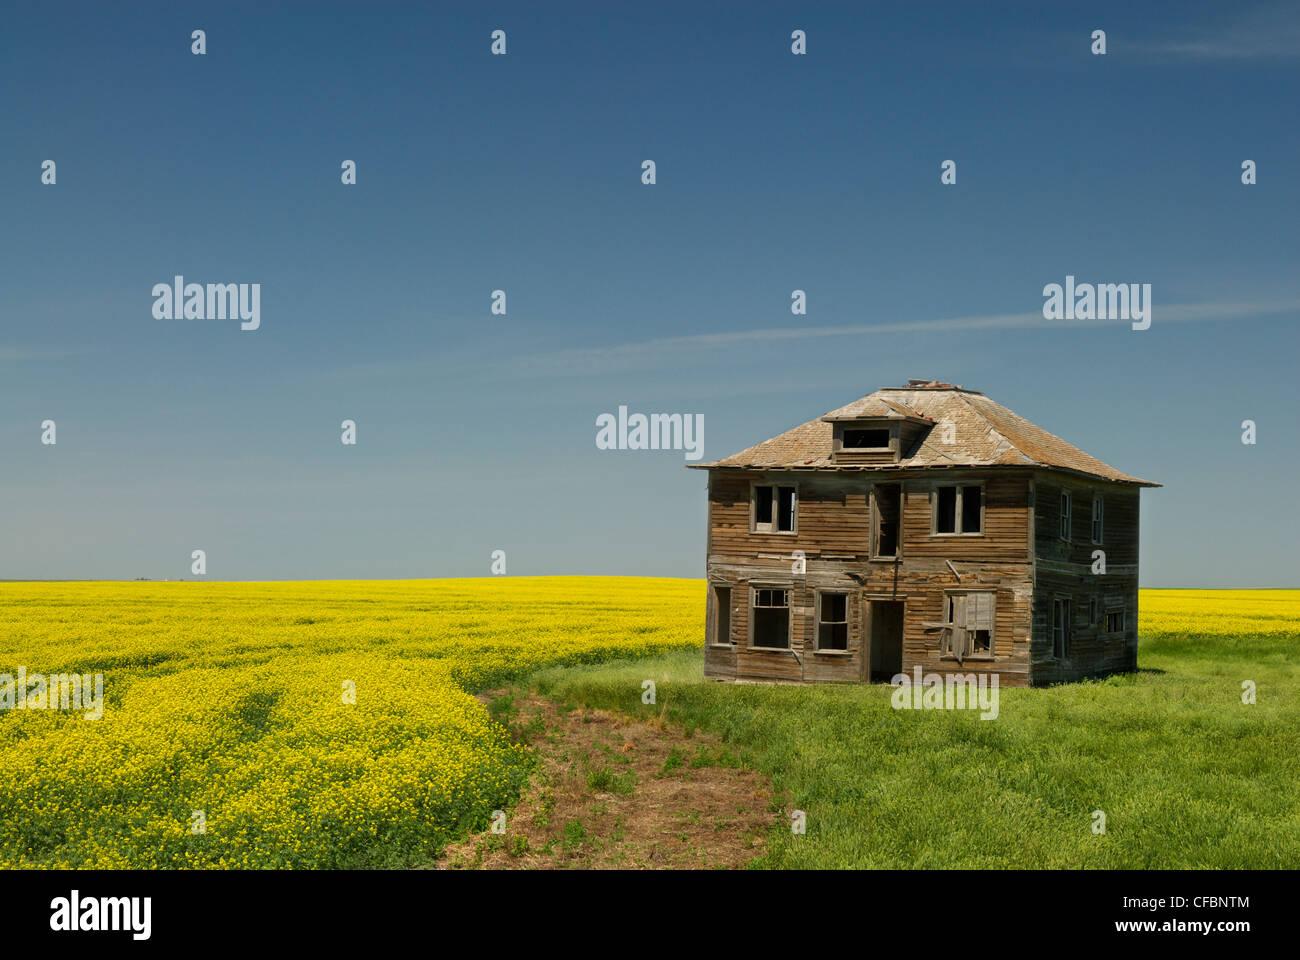 Abandoned farmhouse and canola field near Leader, Saskatchewan, Canada Stock Photo